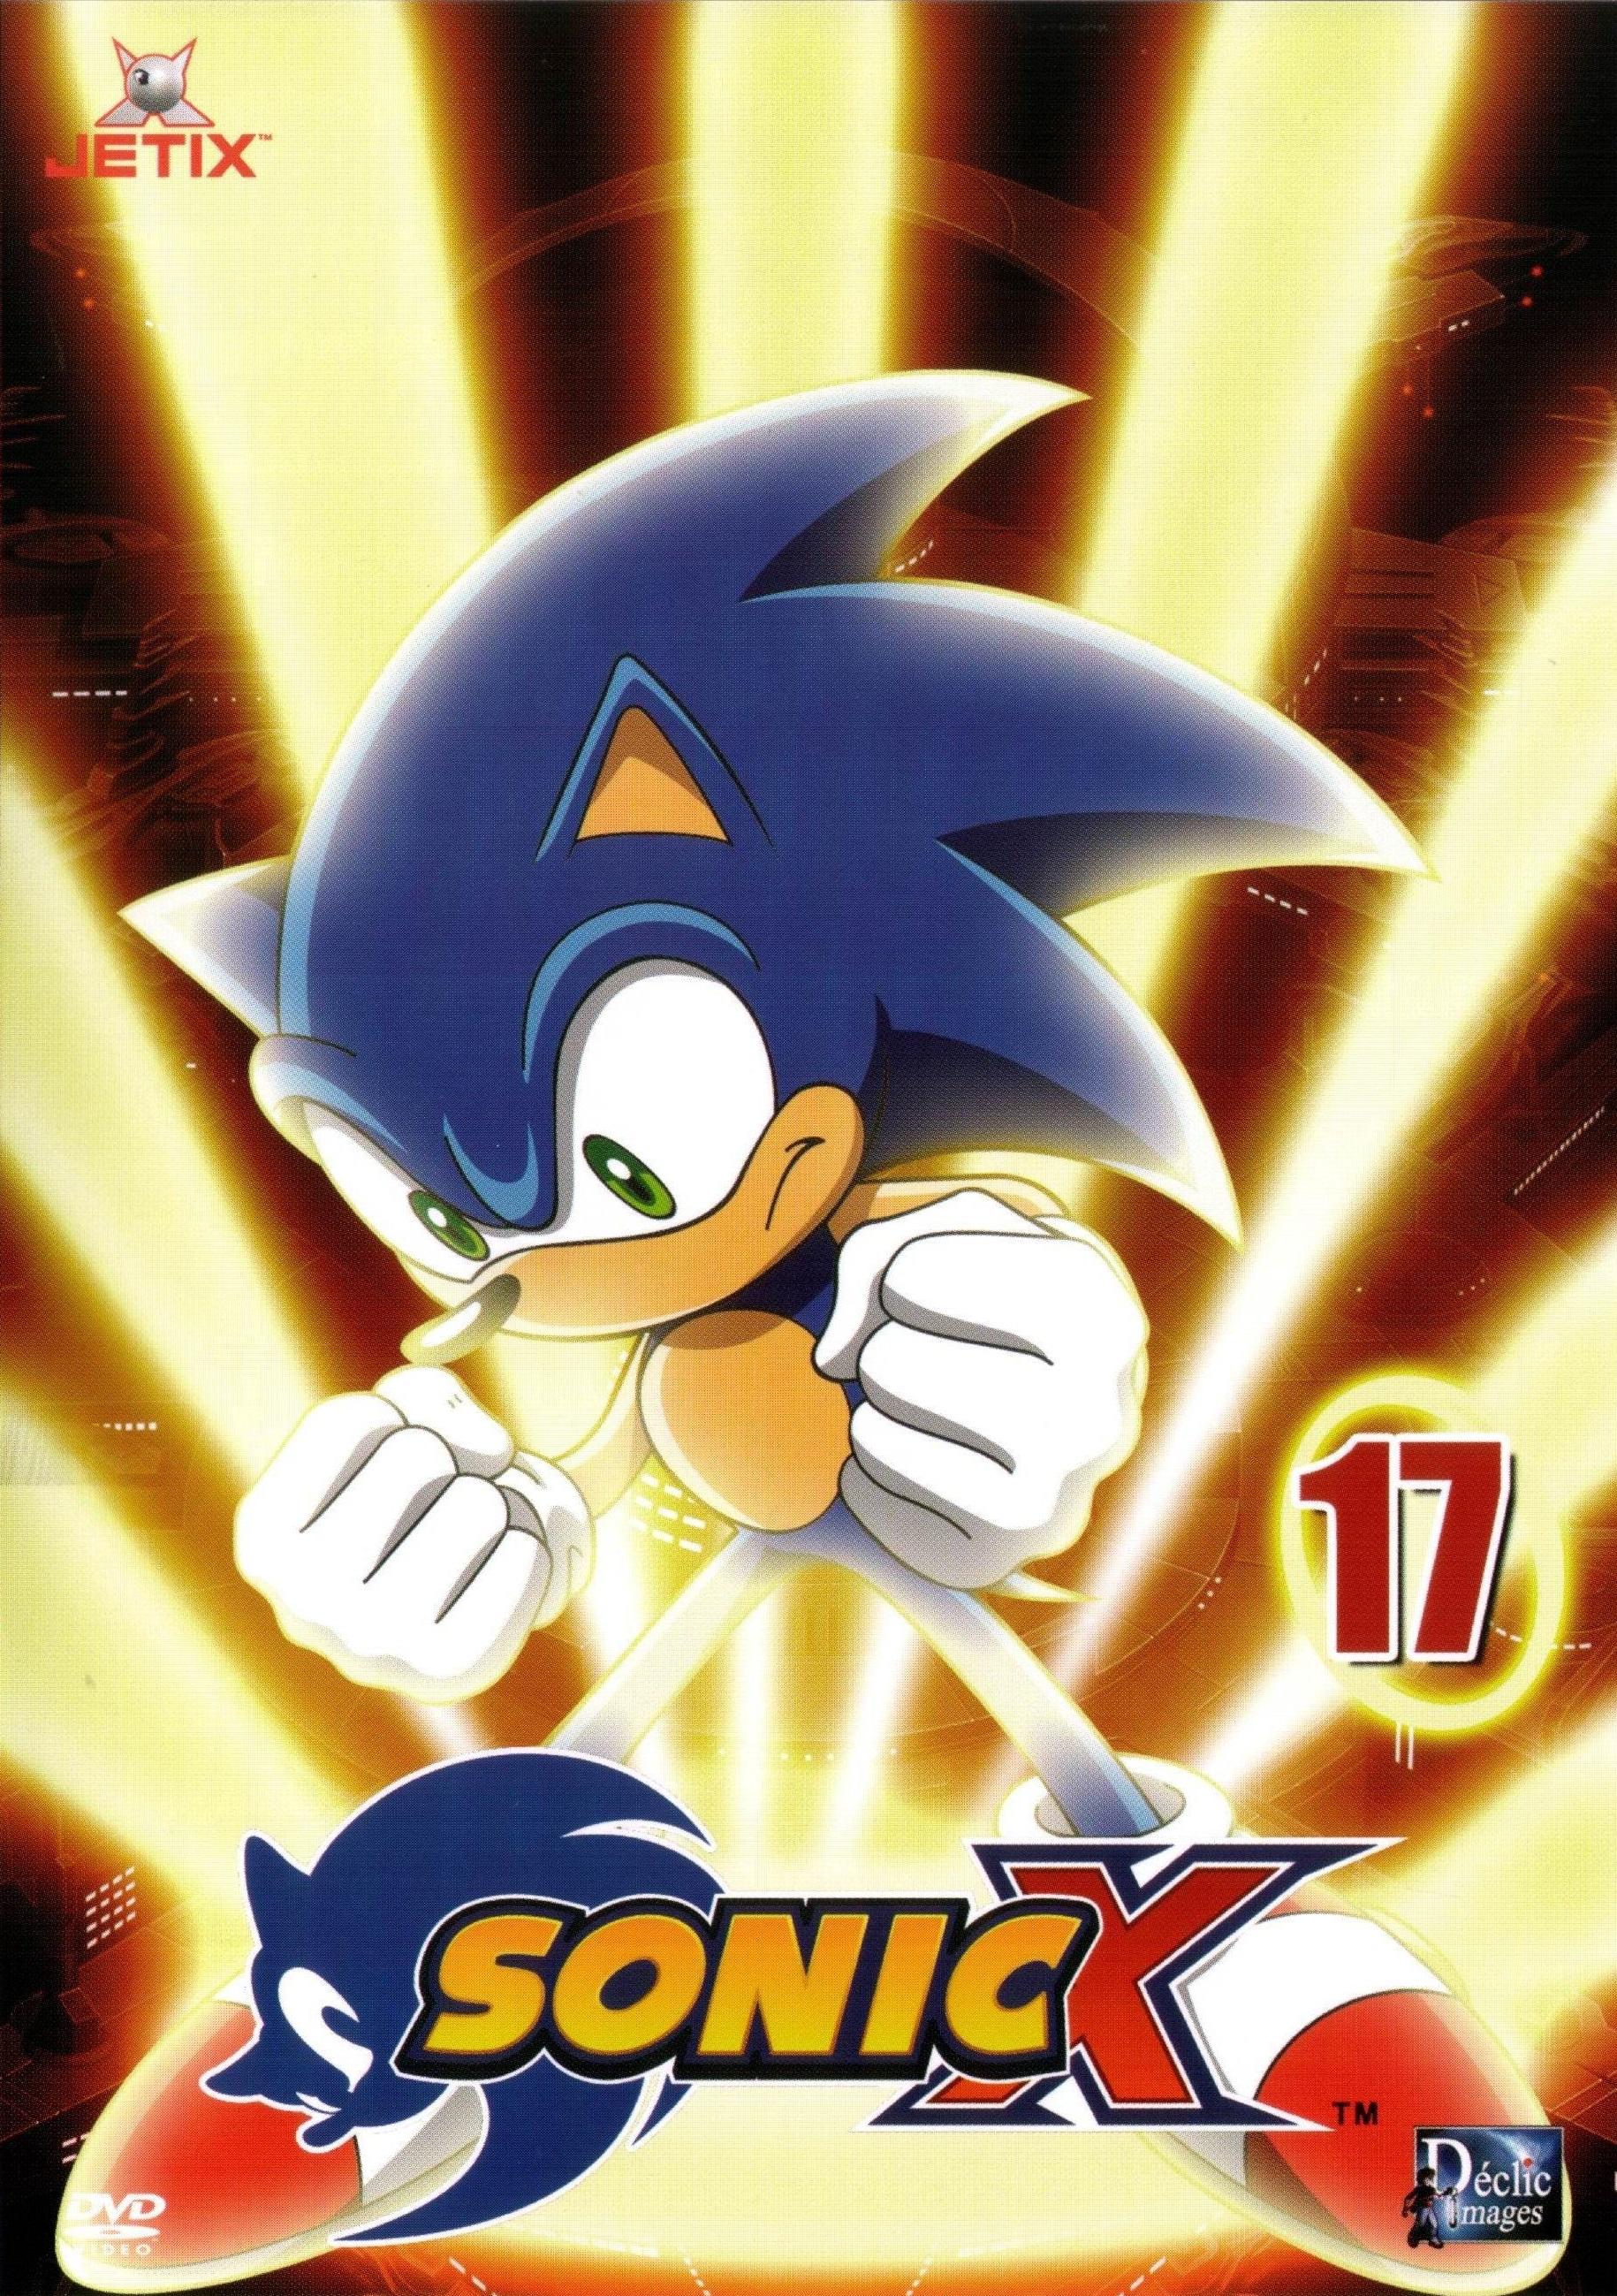 File:Sonic X Vol 17.jpg